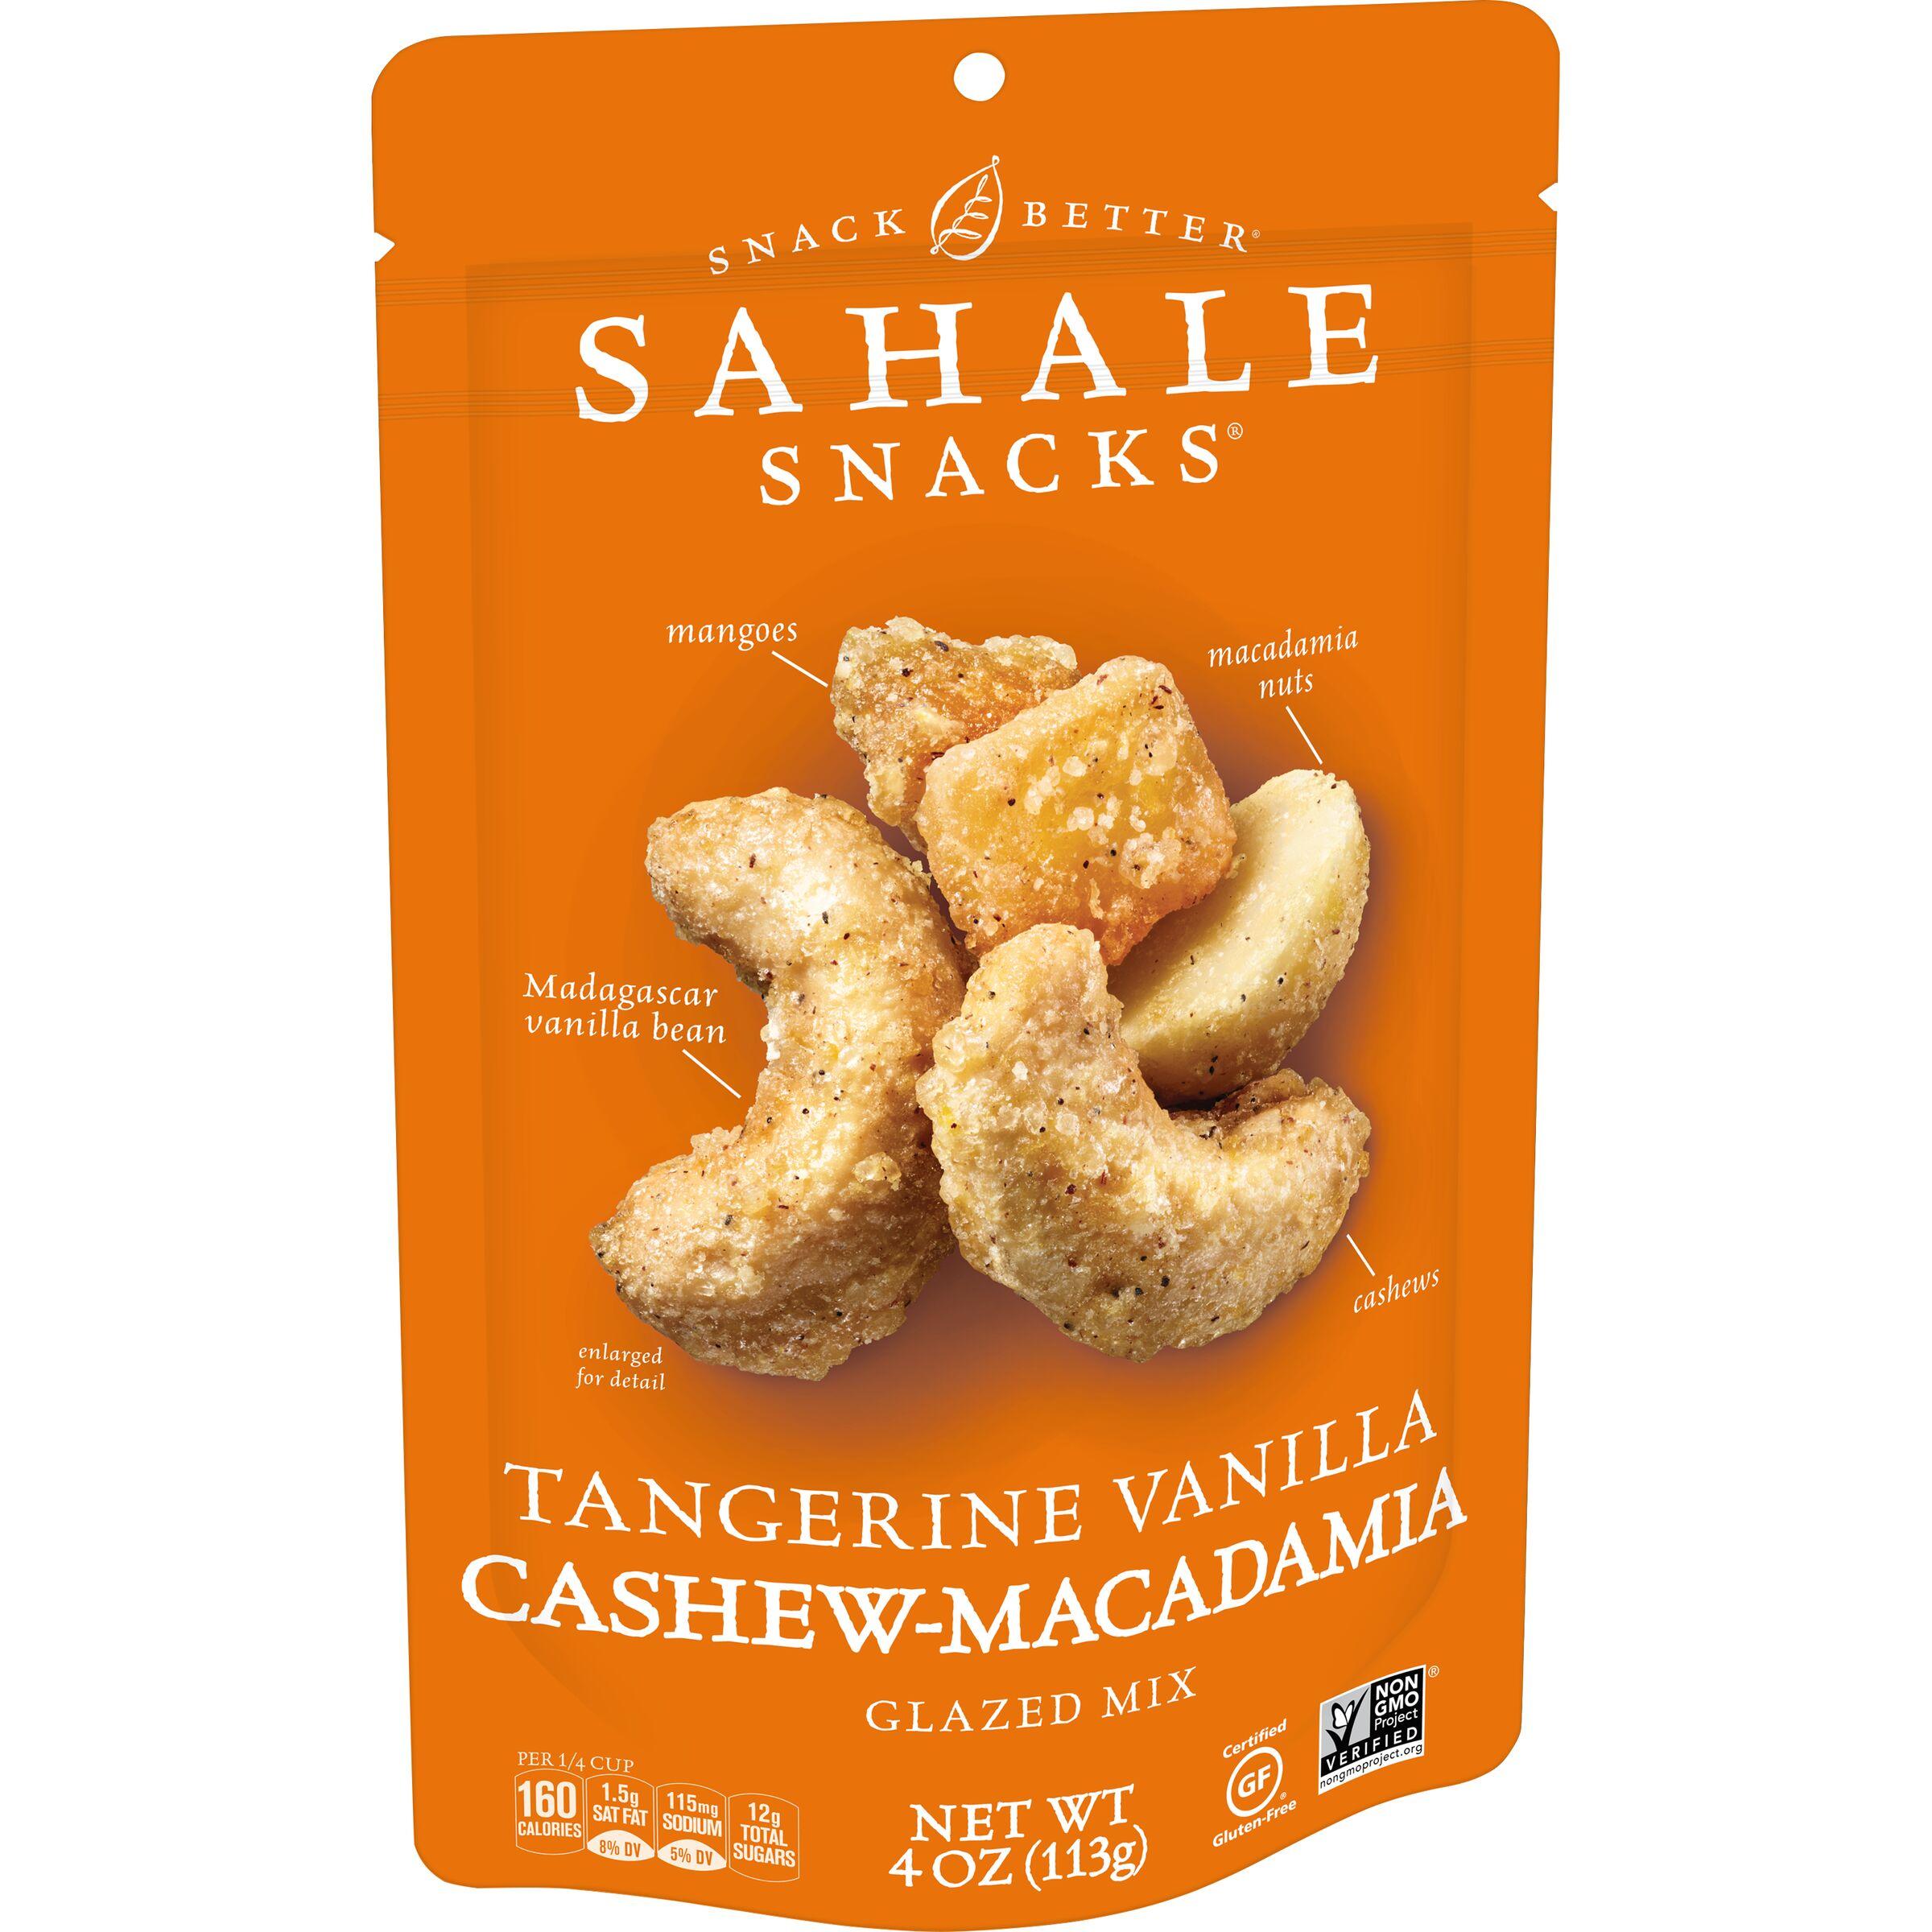 Sahale Snacks  Tangerine Vanilla Cashew-Macadamia Glazed Mix